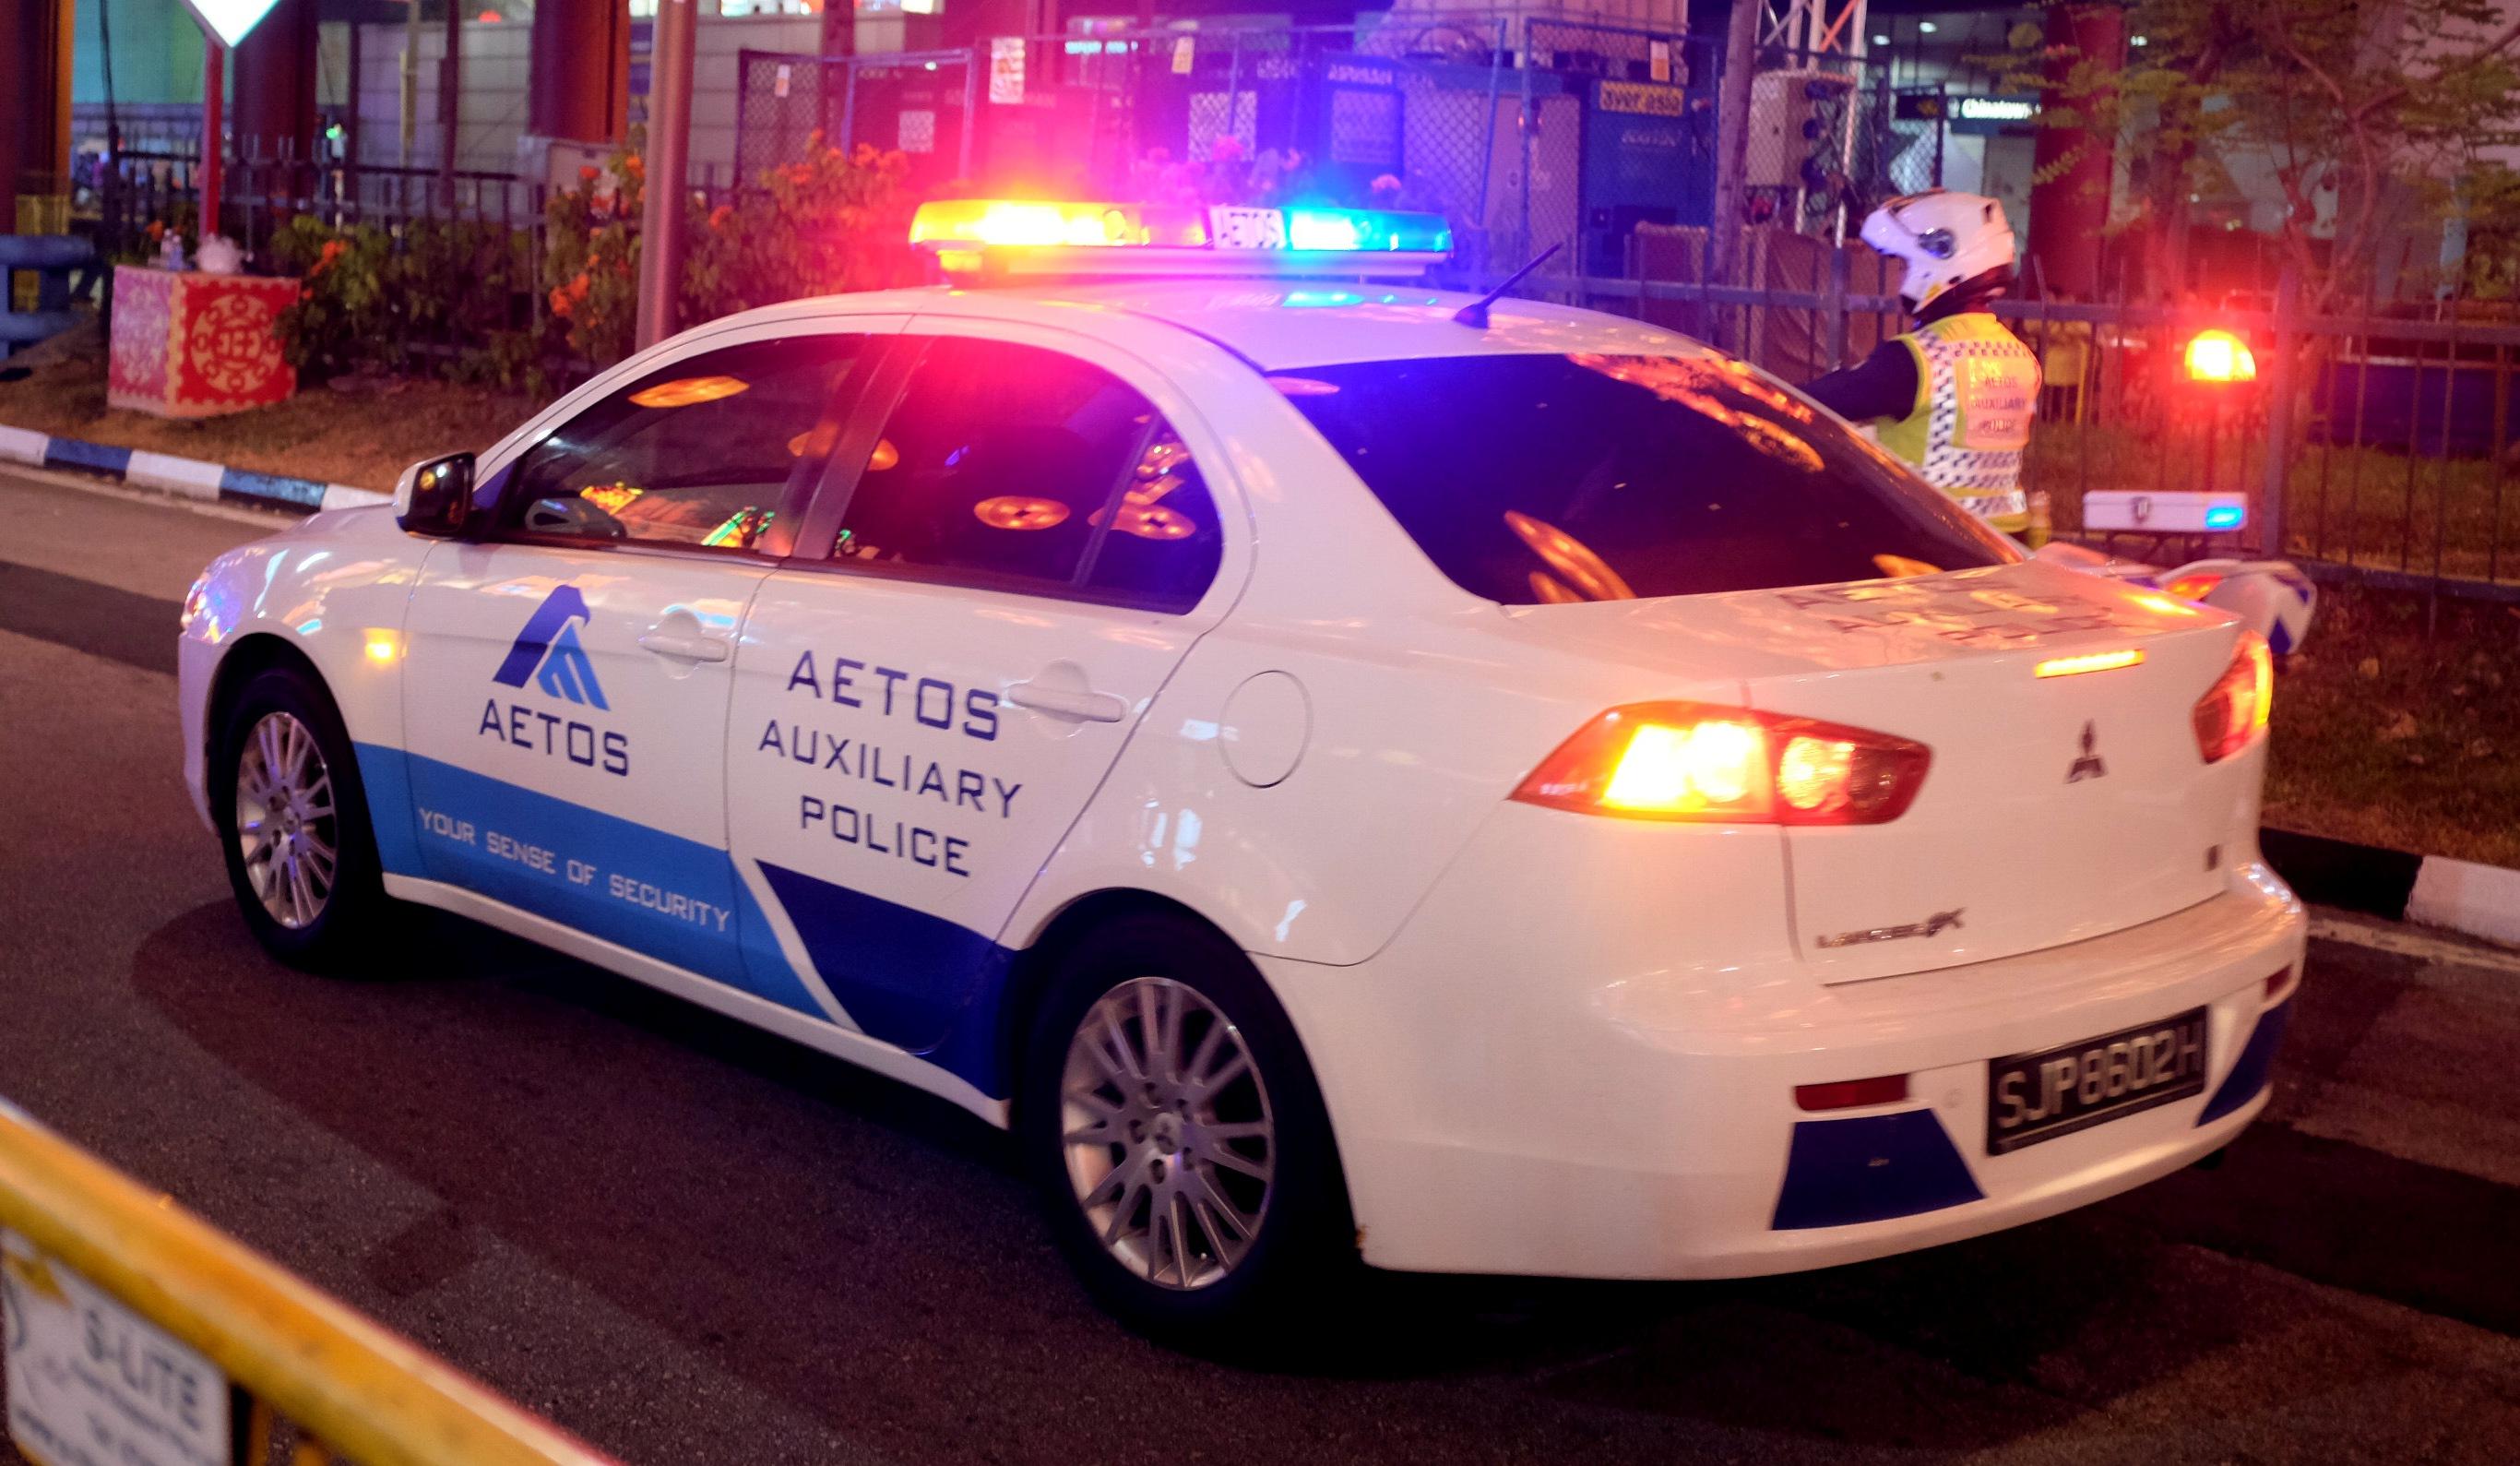 Ex Police Car Specialist Manchester Reviews